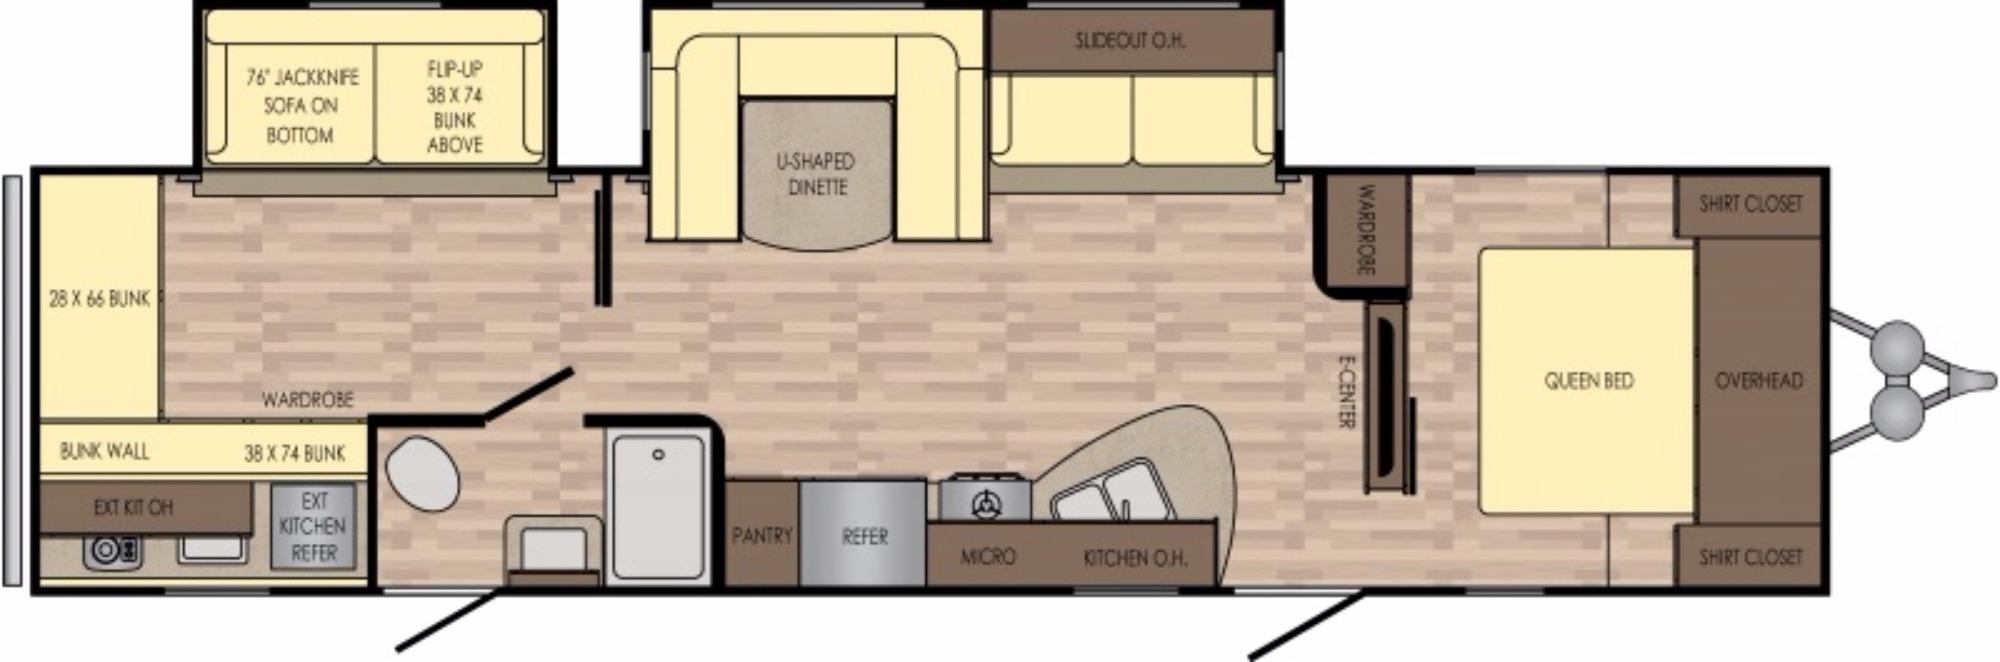 View Floor Plan for 2017 CROSSROADS VOLANTE 33SB